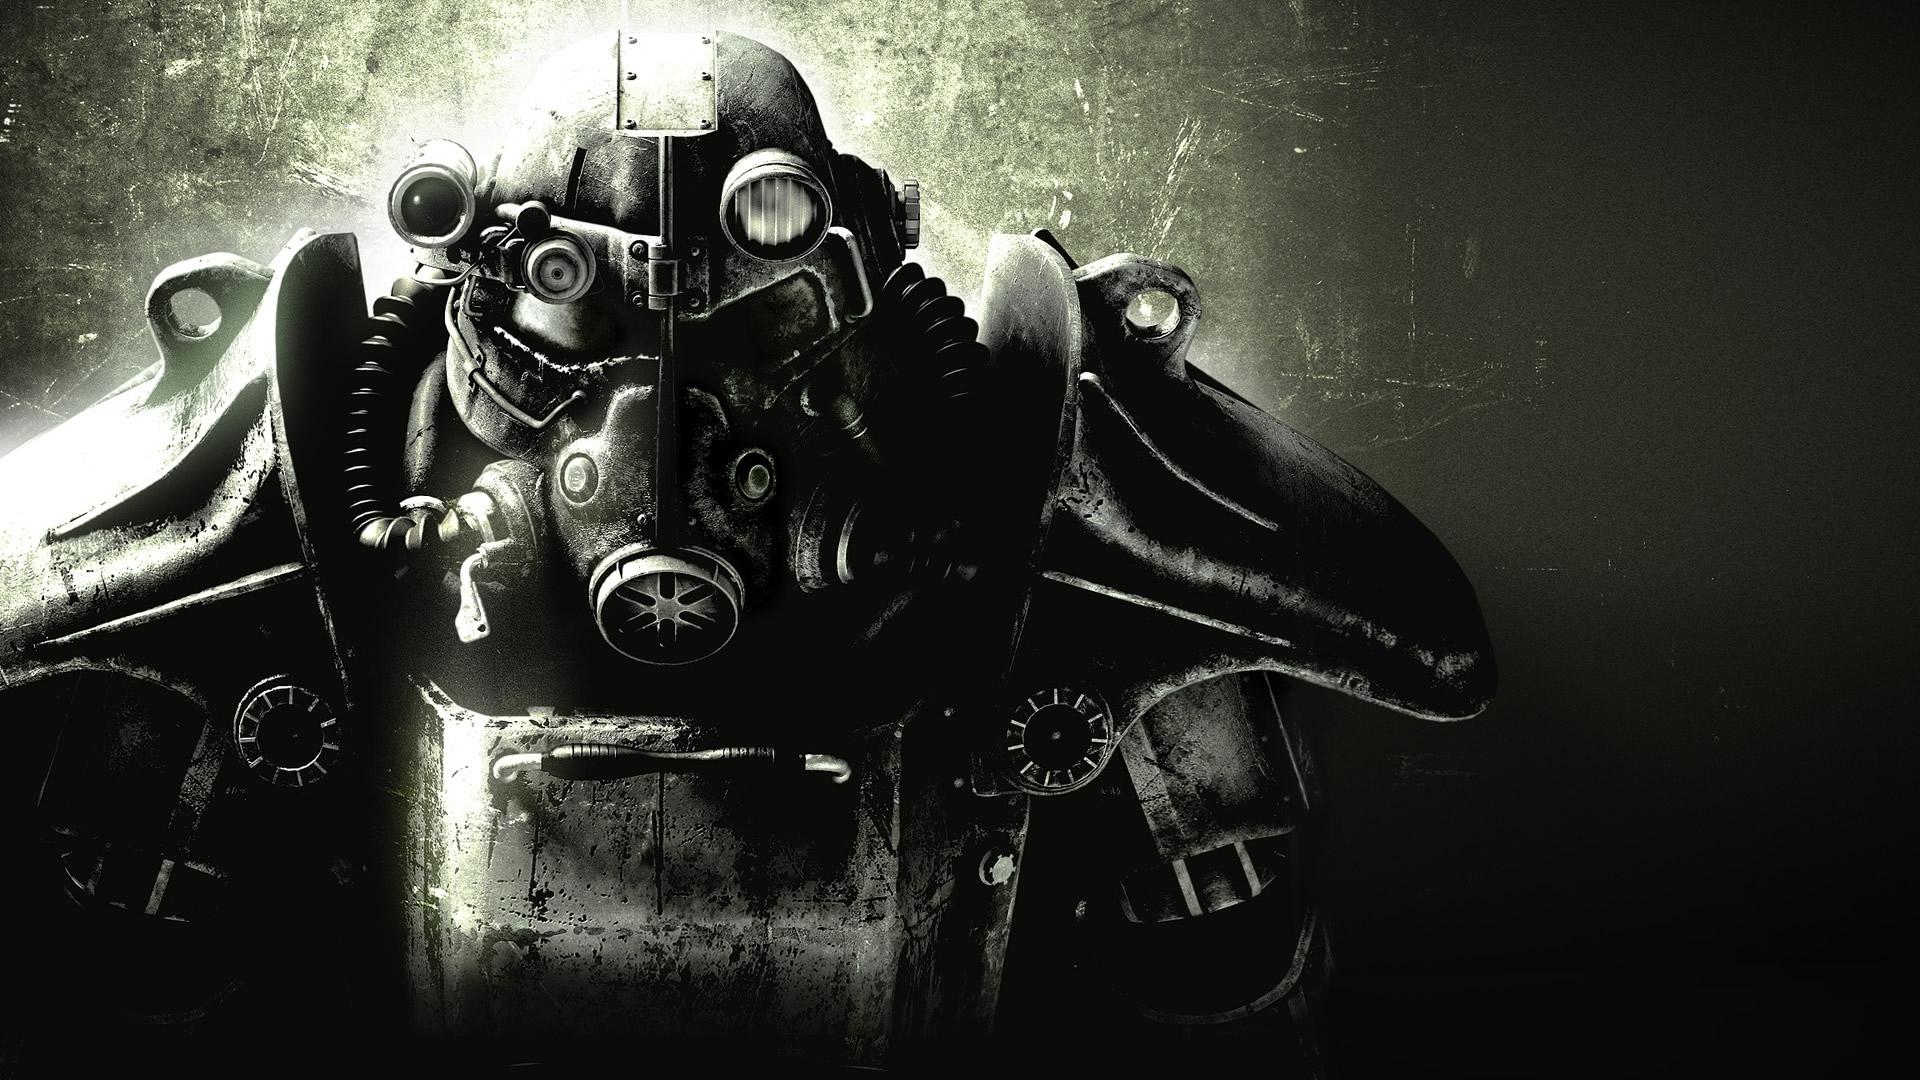 Download Fallout Fallout Wallpaper 1920x1080 Wallpoper 1920x1080